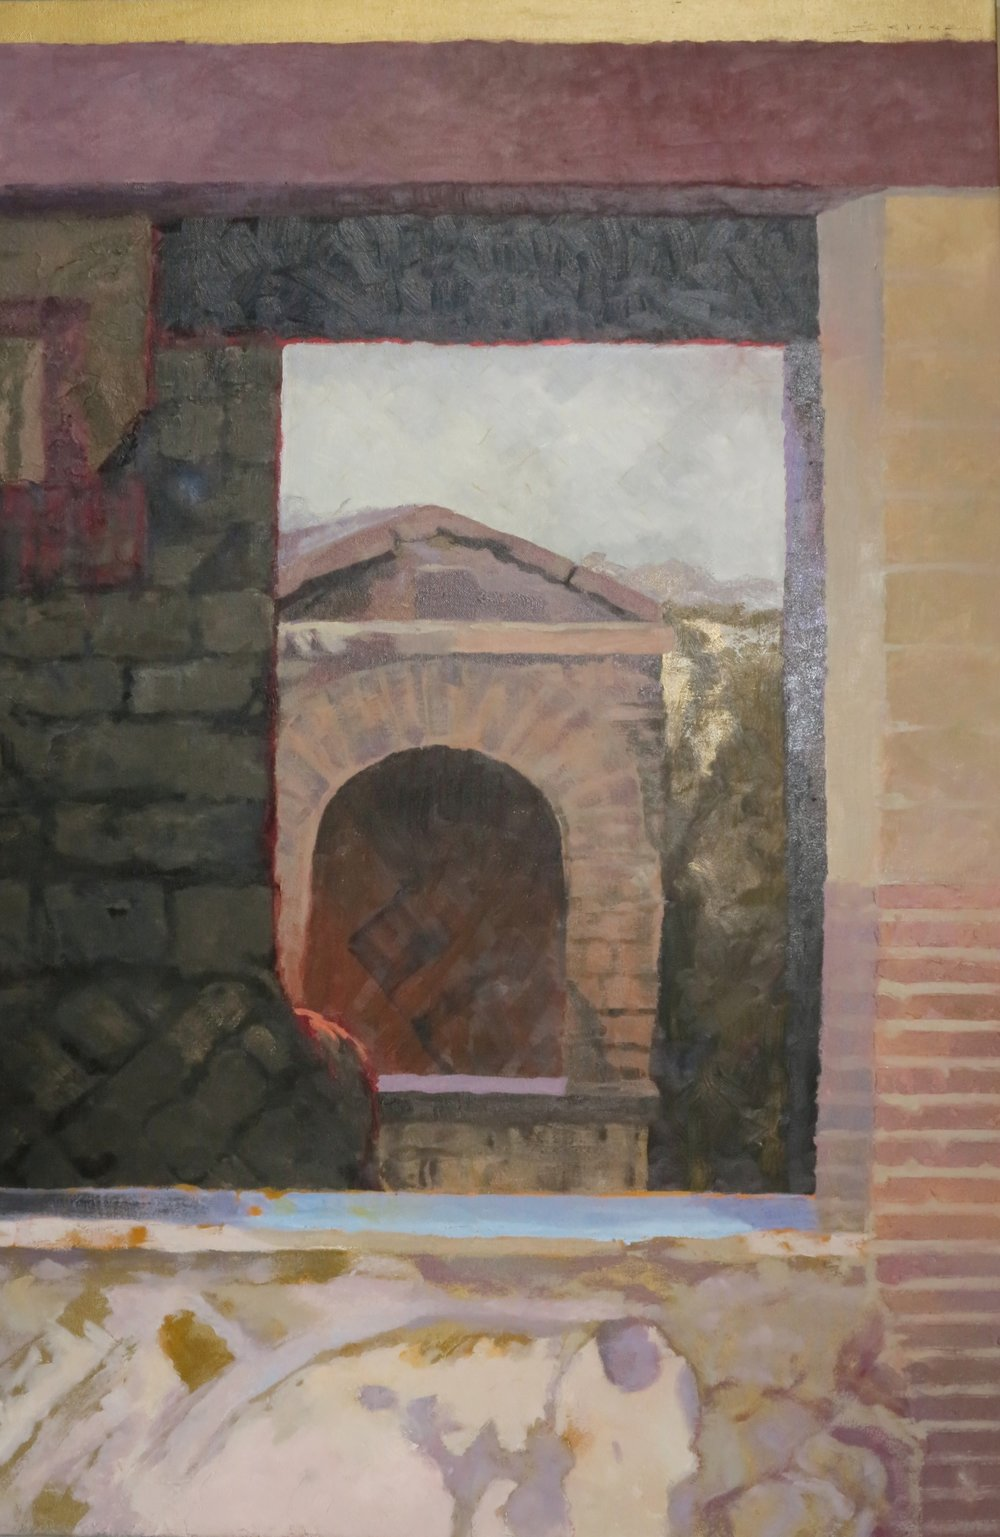 Herculaneum, 36 x 24, oil